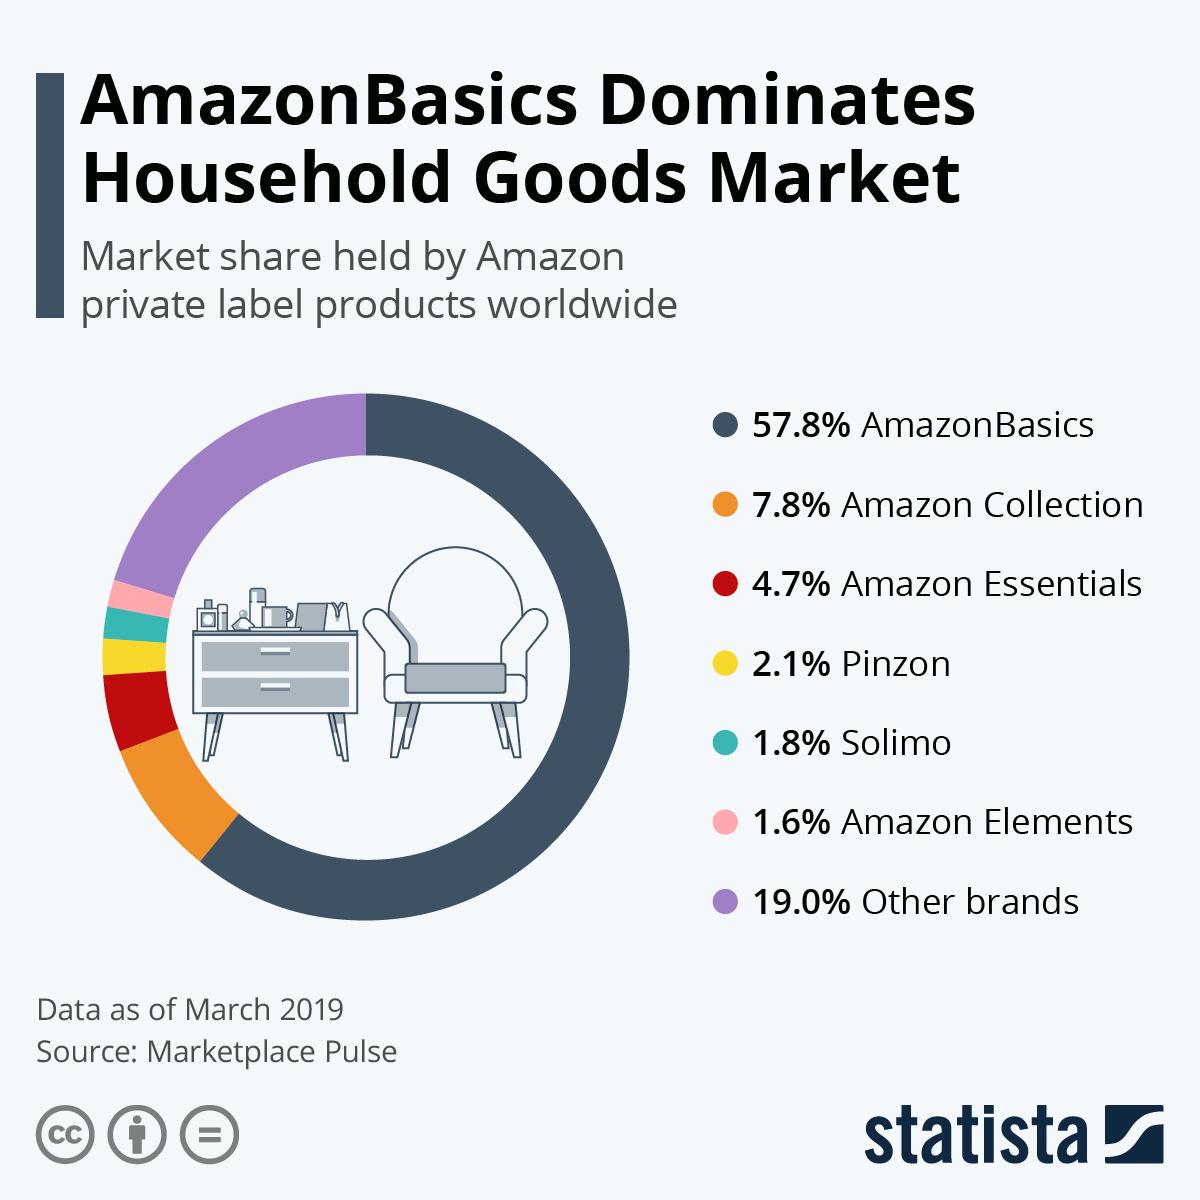 AmazonBasics Dominate Household Goods Market #infographic